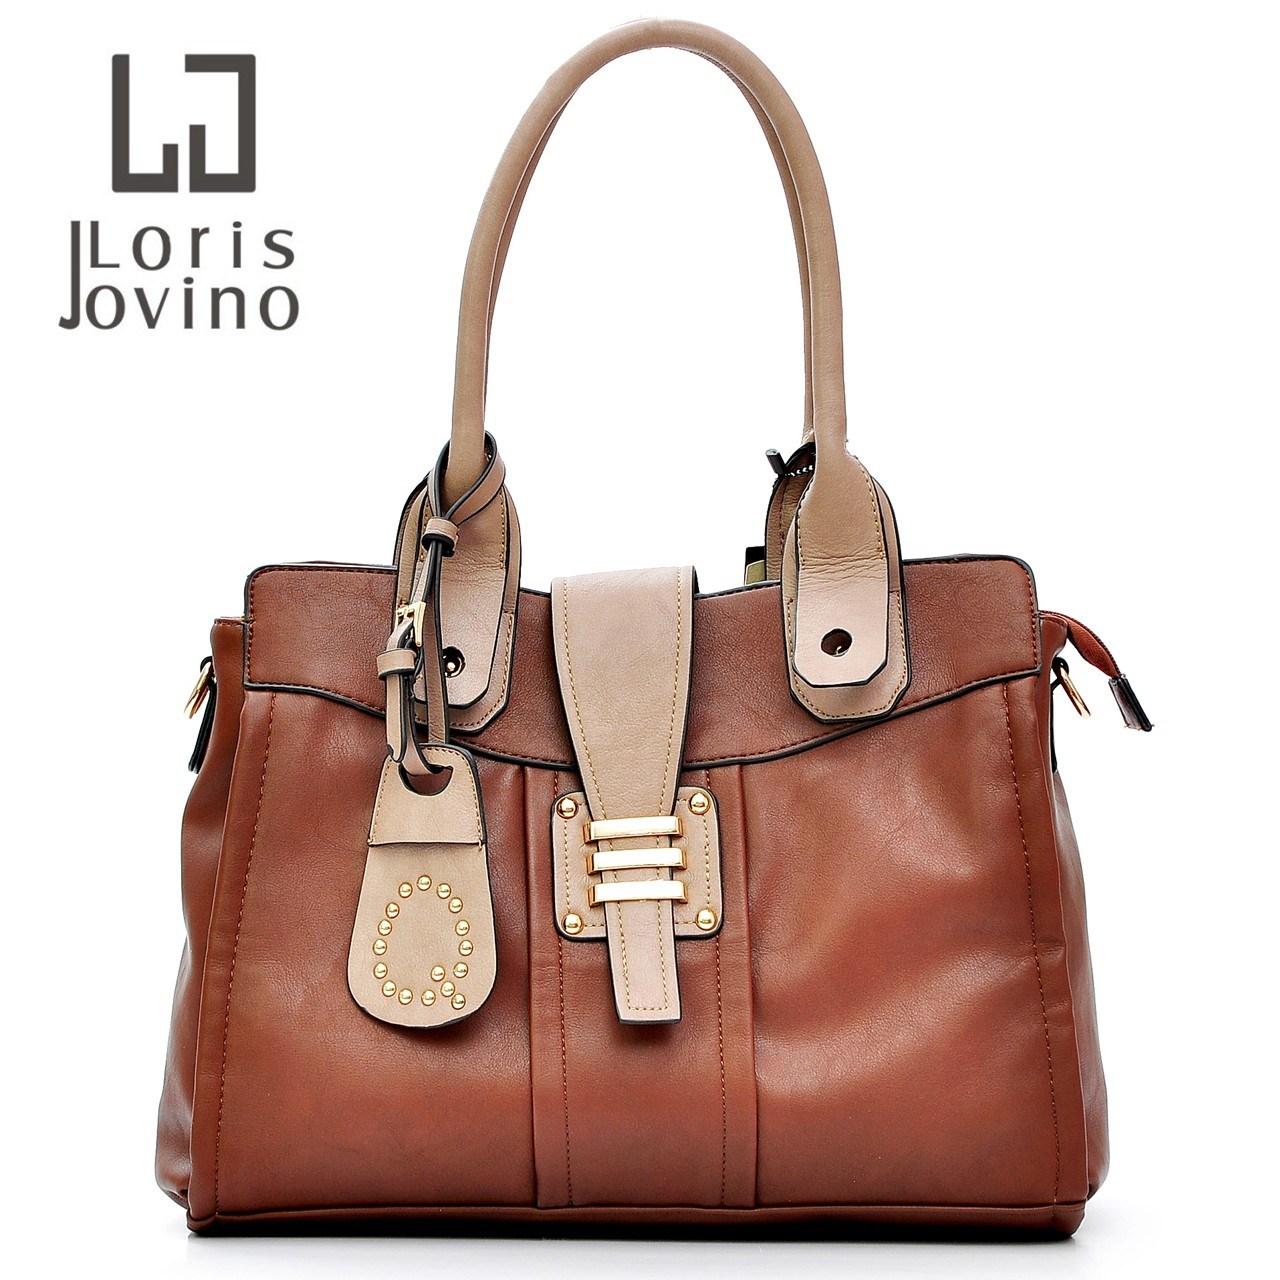 2013 new arrival ladies designer handbags z0114 male